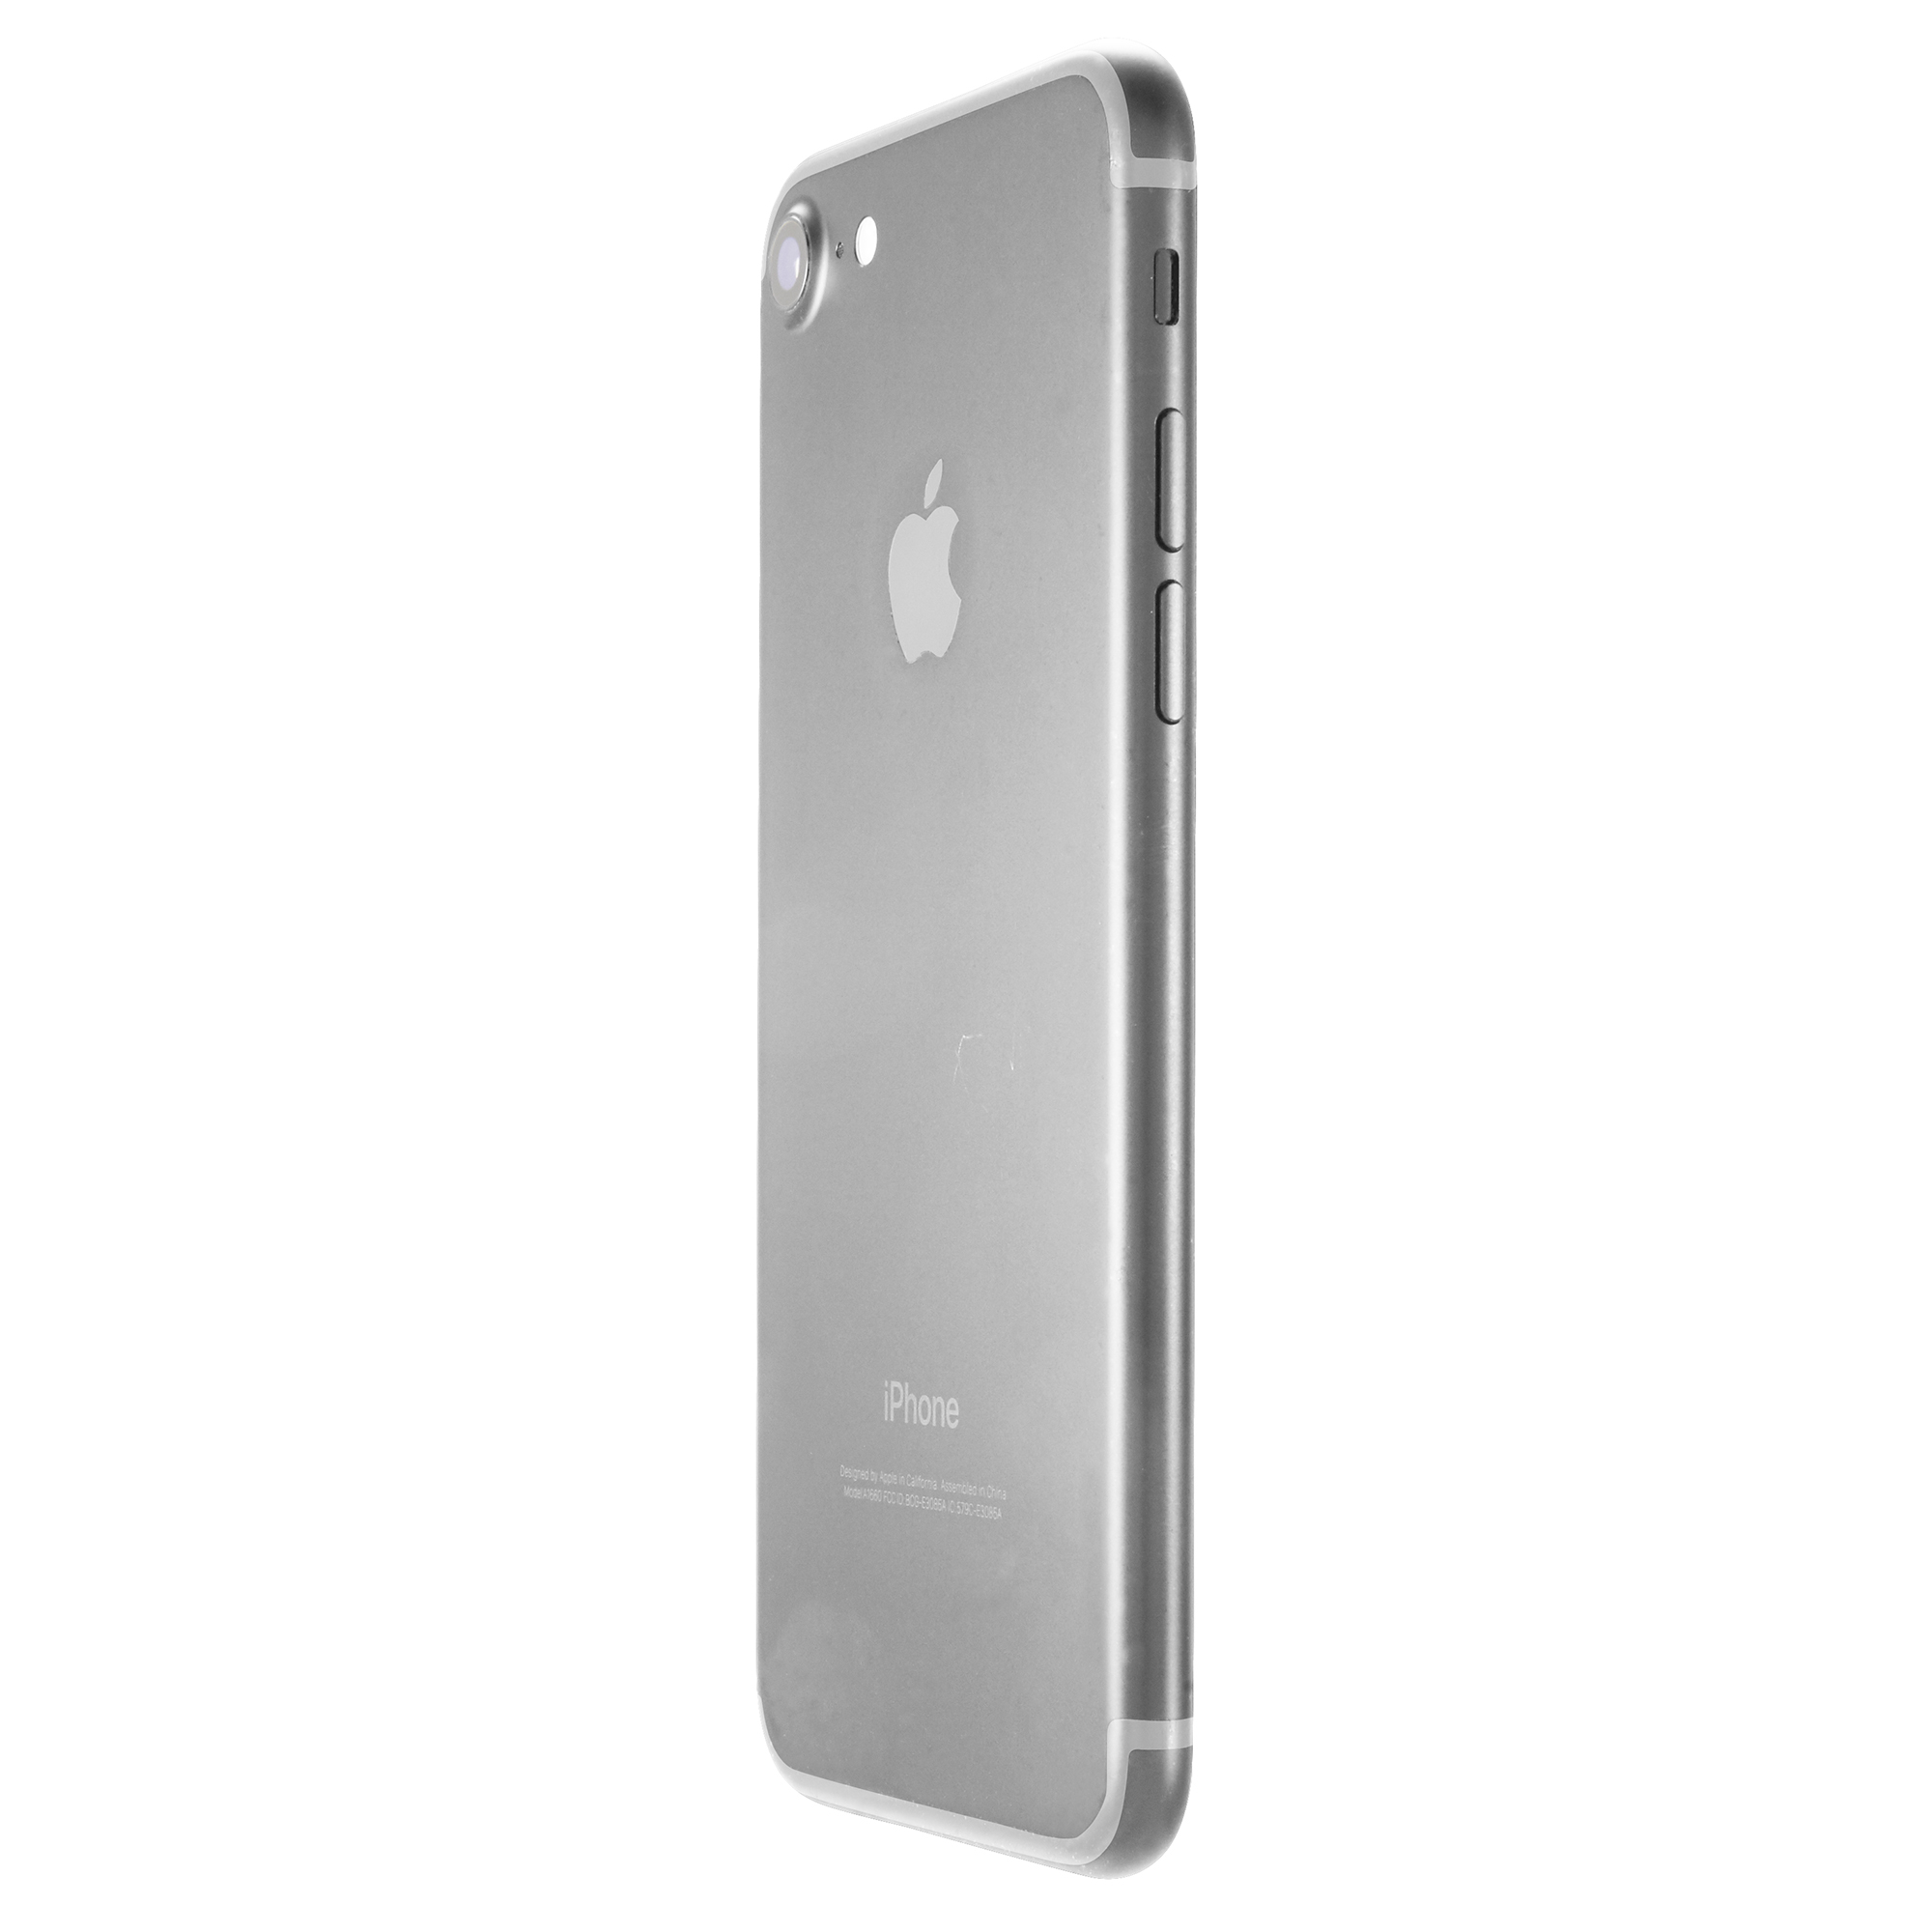 Apple iPhone 7 a1778 32GB GSM Unlocked - Fair Condition